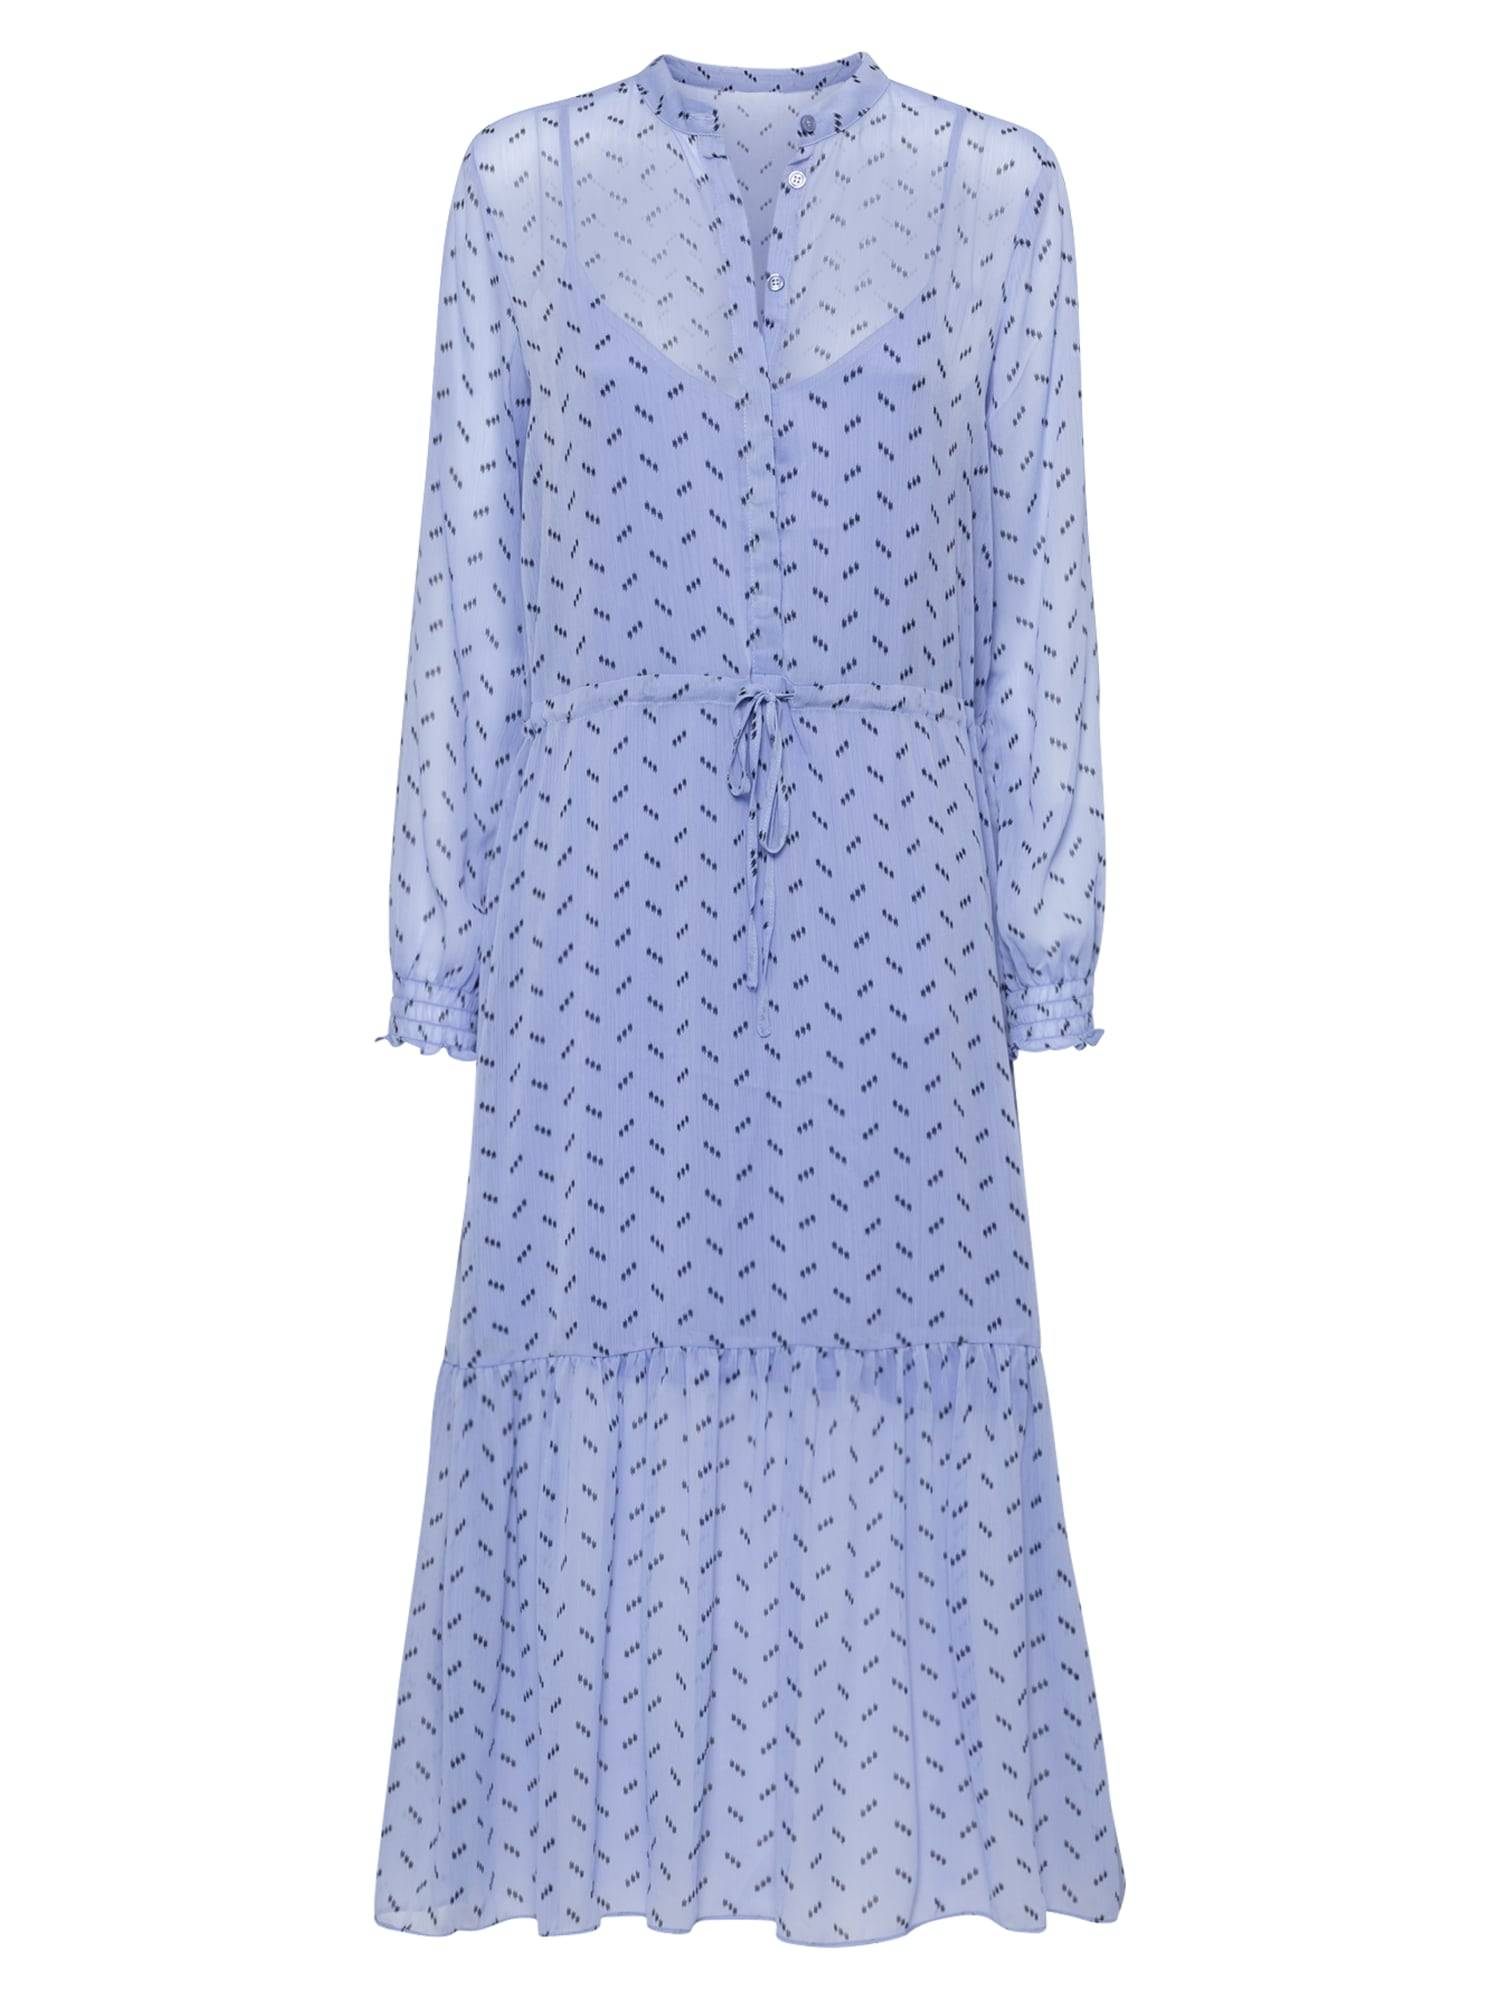 mbym Robe-chemise 'Diaz'  - Bleu - Taille: XL - female